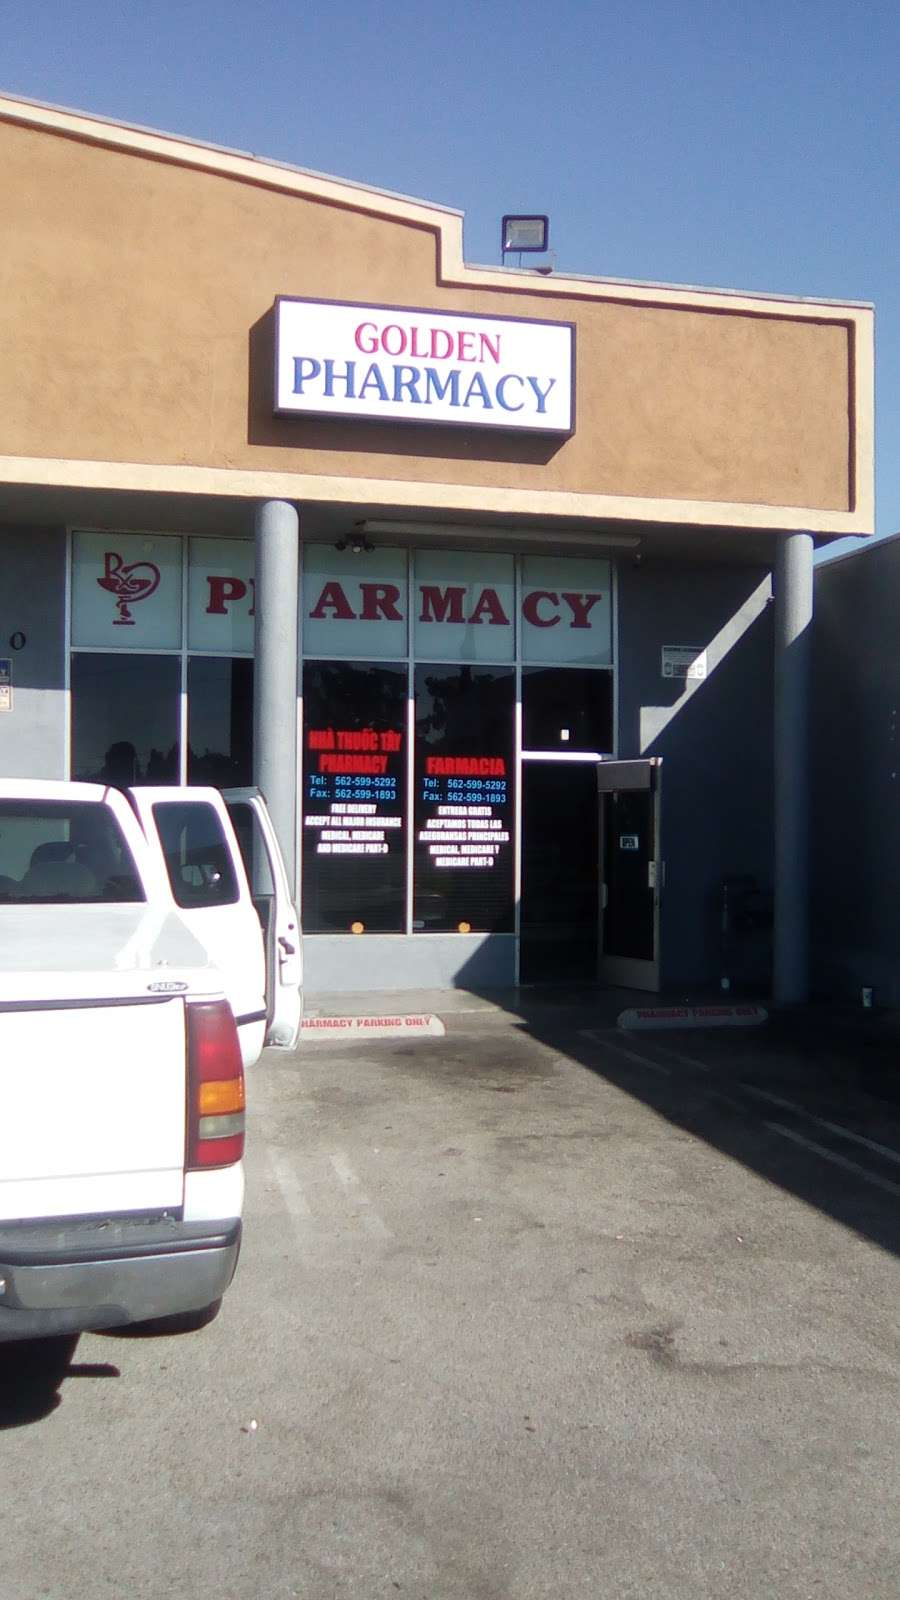 Golden Pharmacy - pharmacy    Photo 2 of 2   Address: 1750 Pacific Avenue, Long Beach, CA 90813, USA   Phone: (562) 599-5292